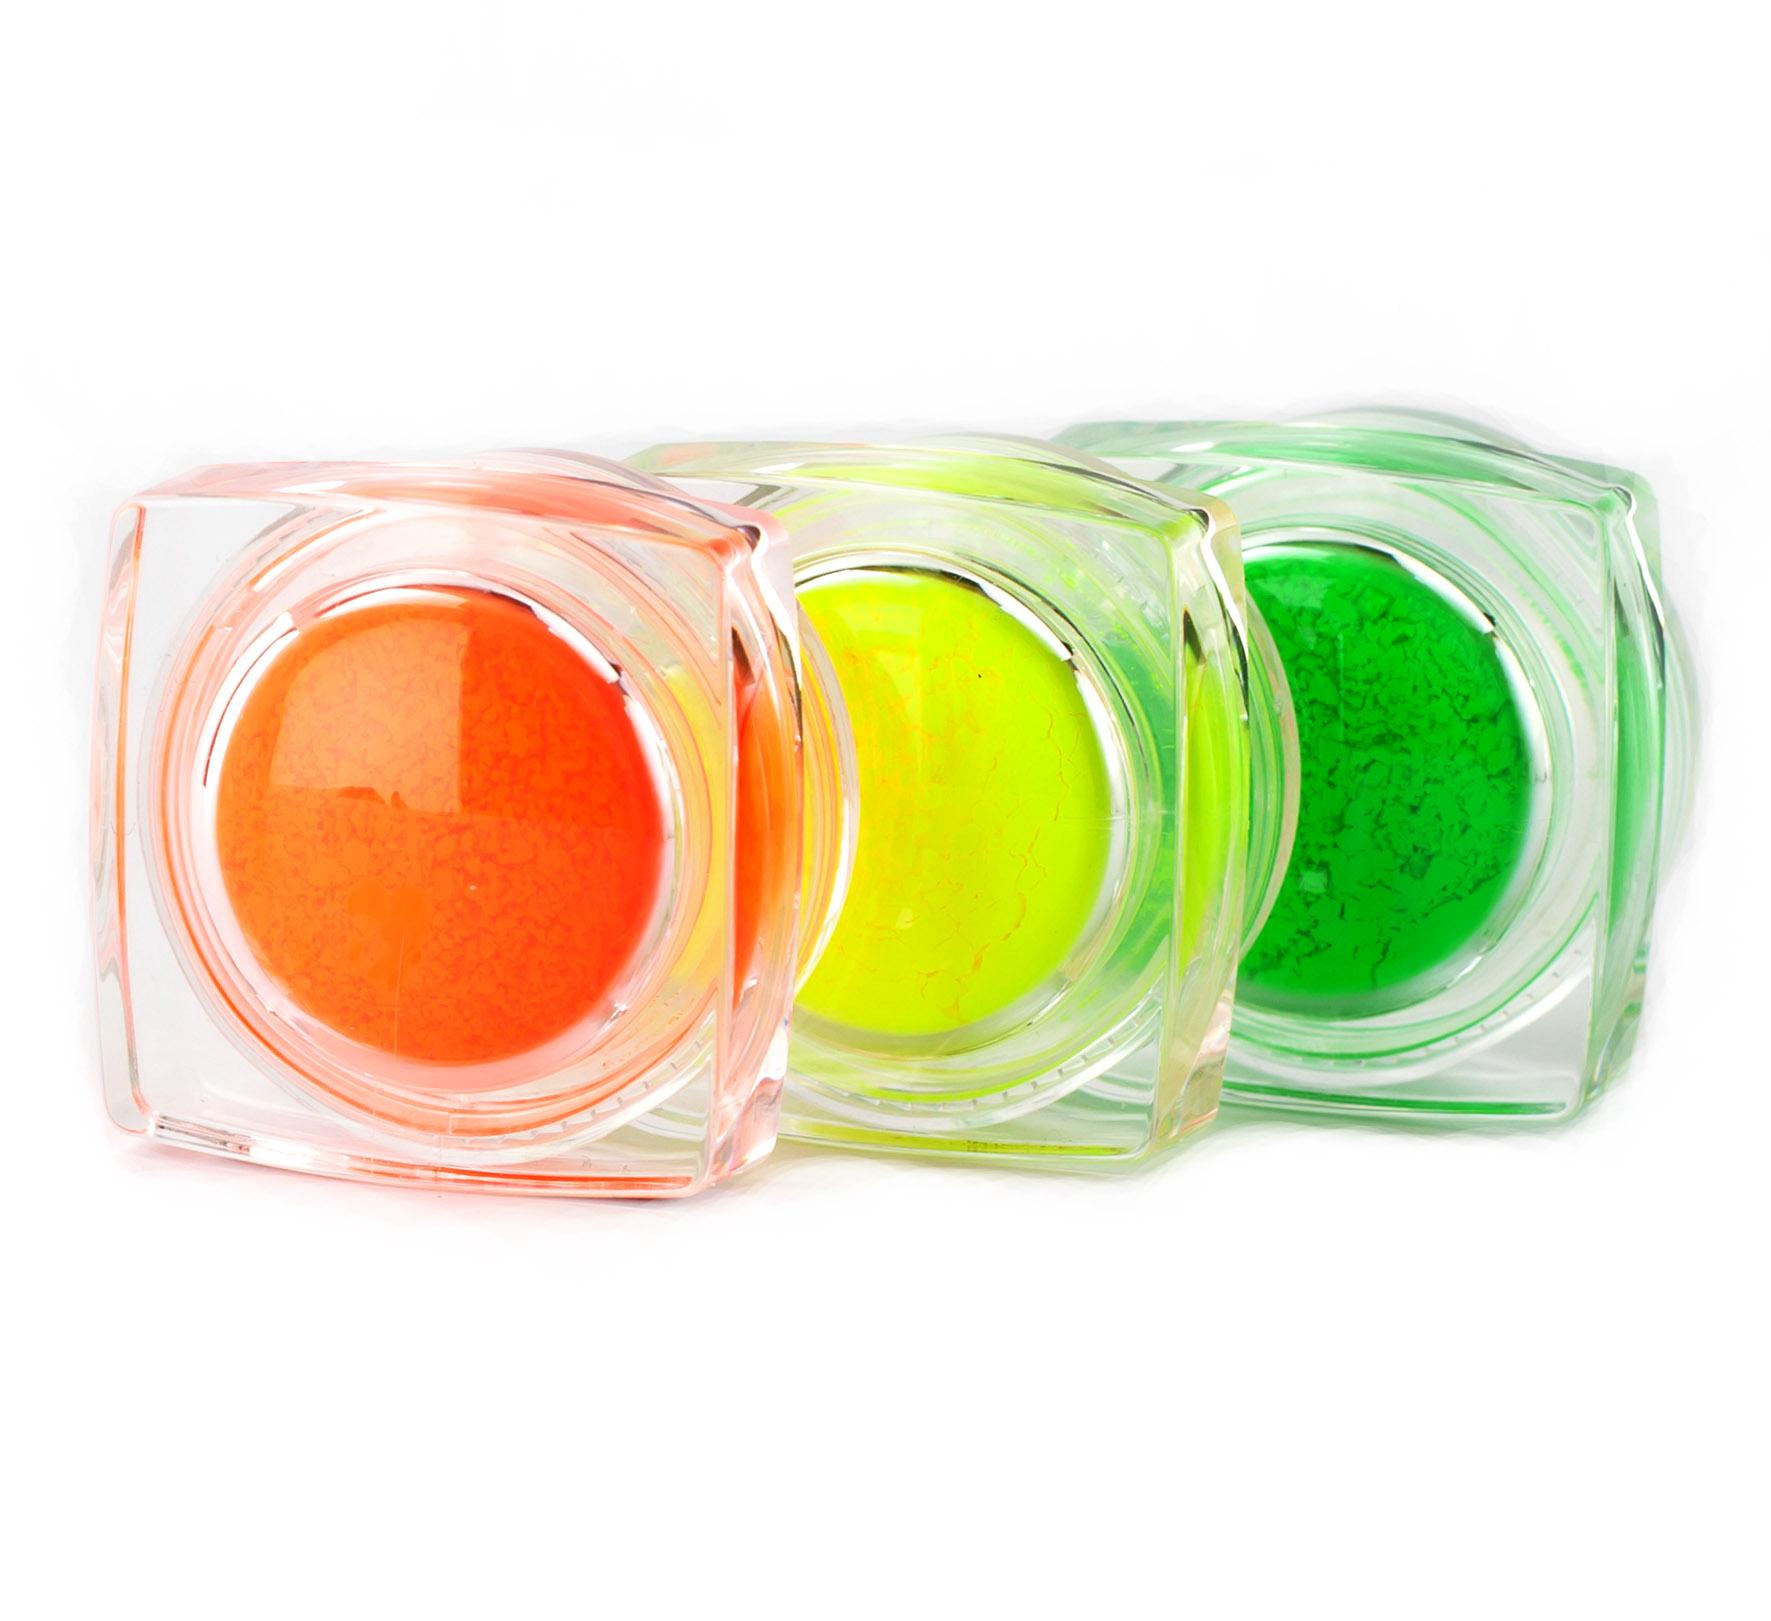 Рассыпчатая флуоресцентная пудра (Pigment Fluo) ATELIER